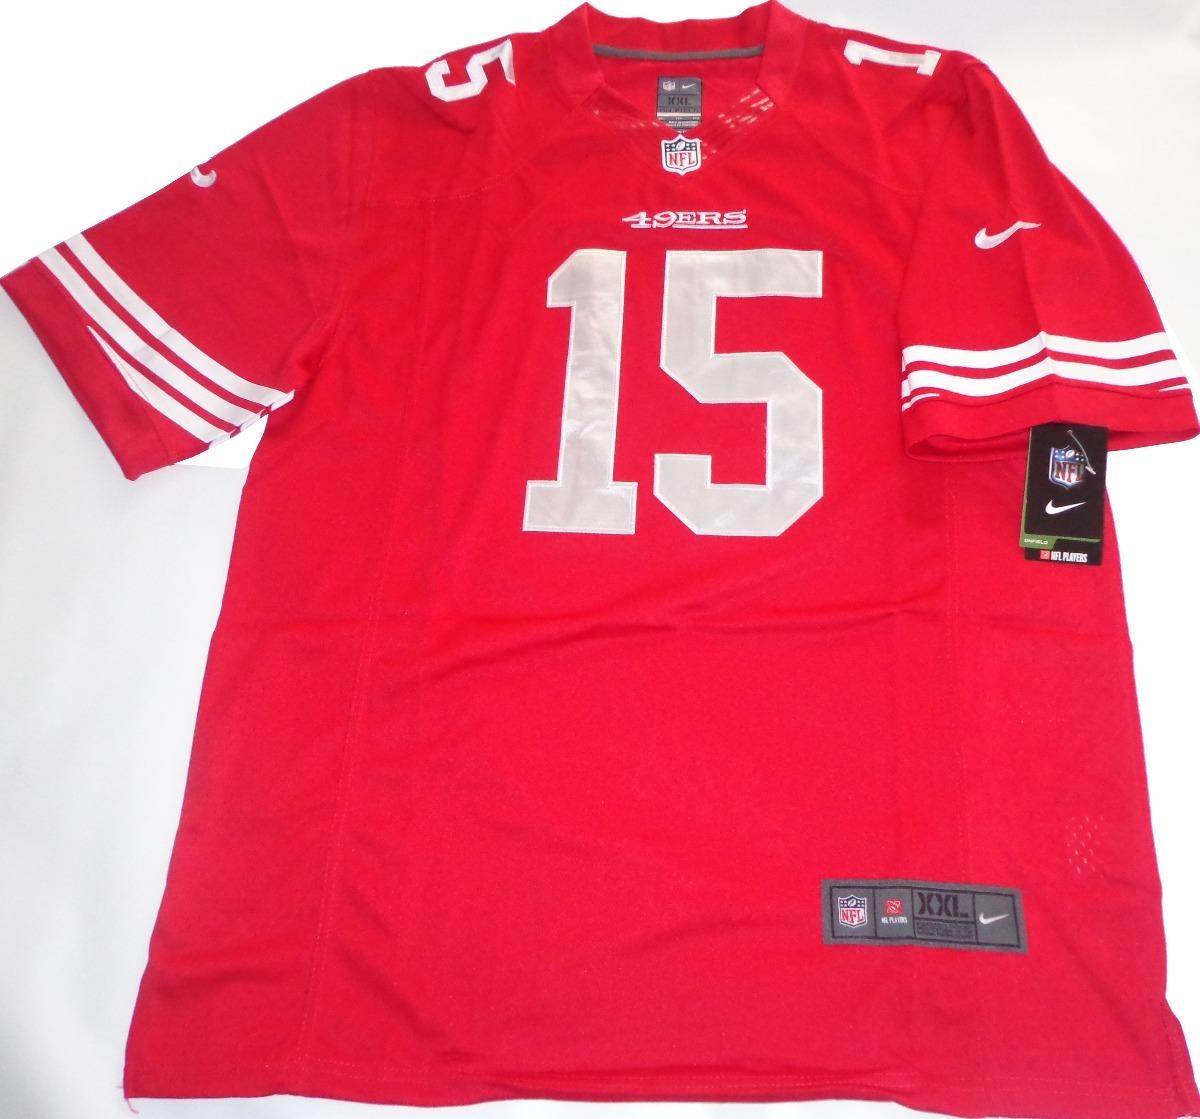 7fb1de1f1a1fa camiseta futbol americano san francisco 49ers usa nike nfl. Cargando zoom.